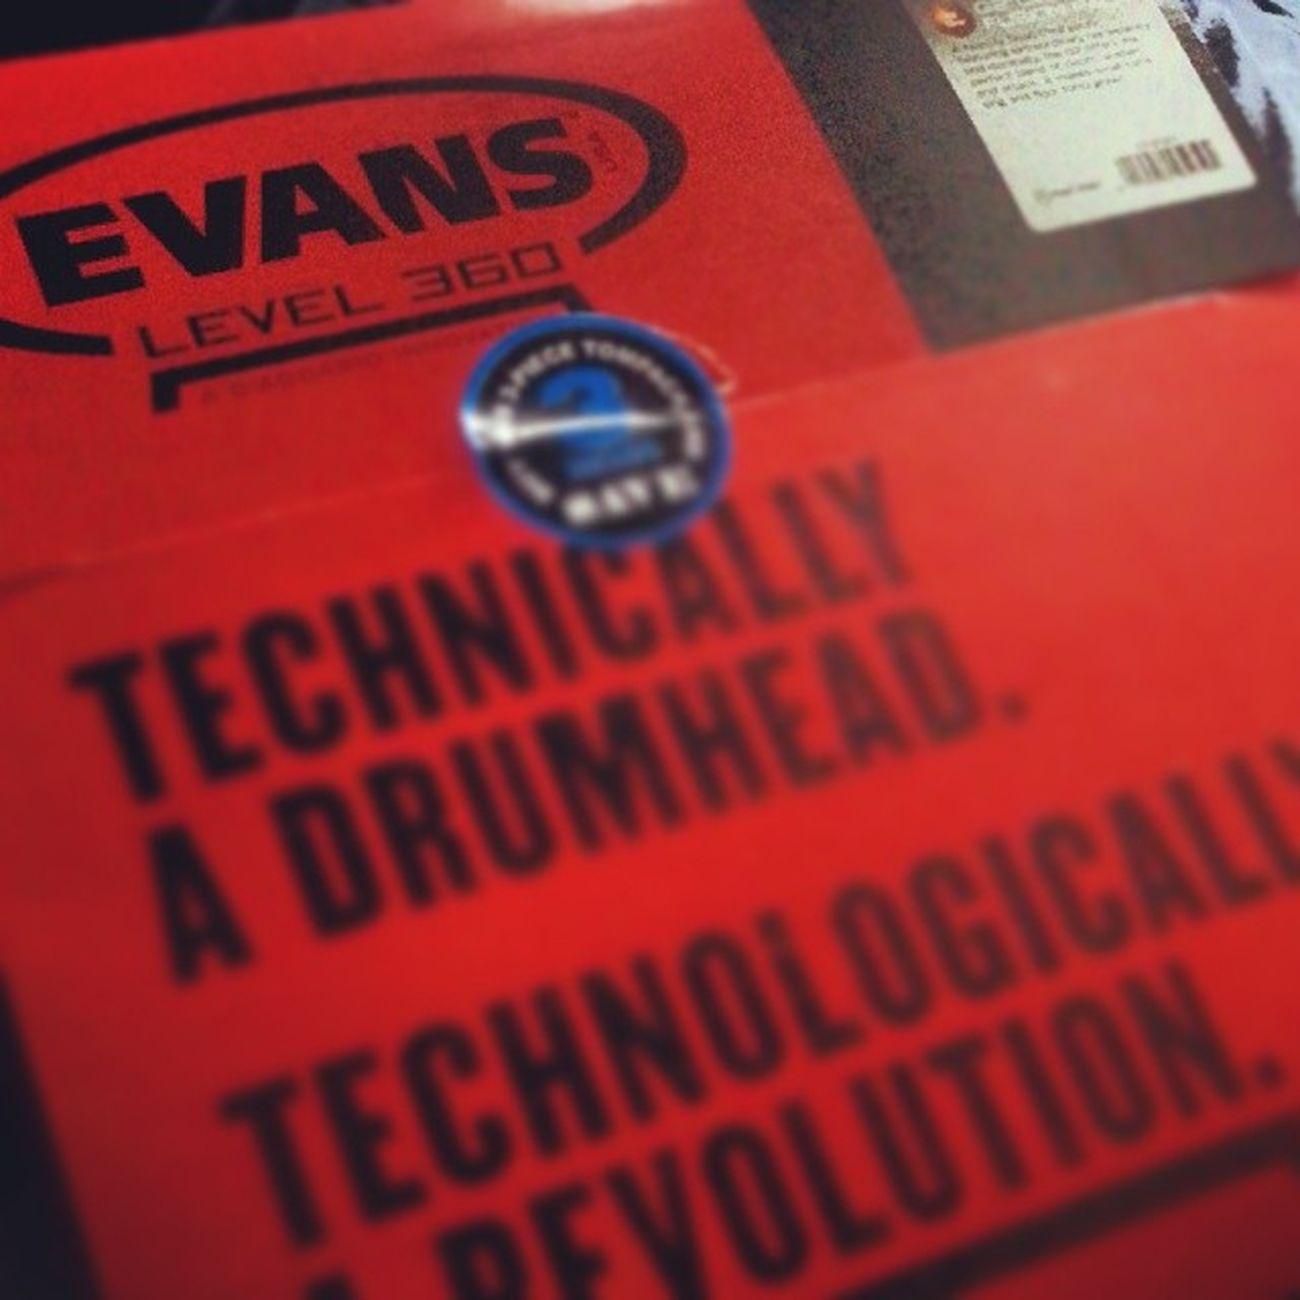 New Drumheads just arrived Evans Drummer4life Drumlife drummer